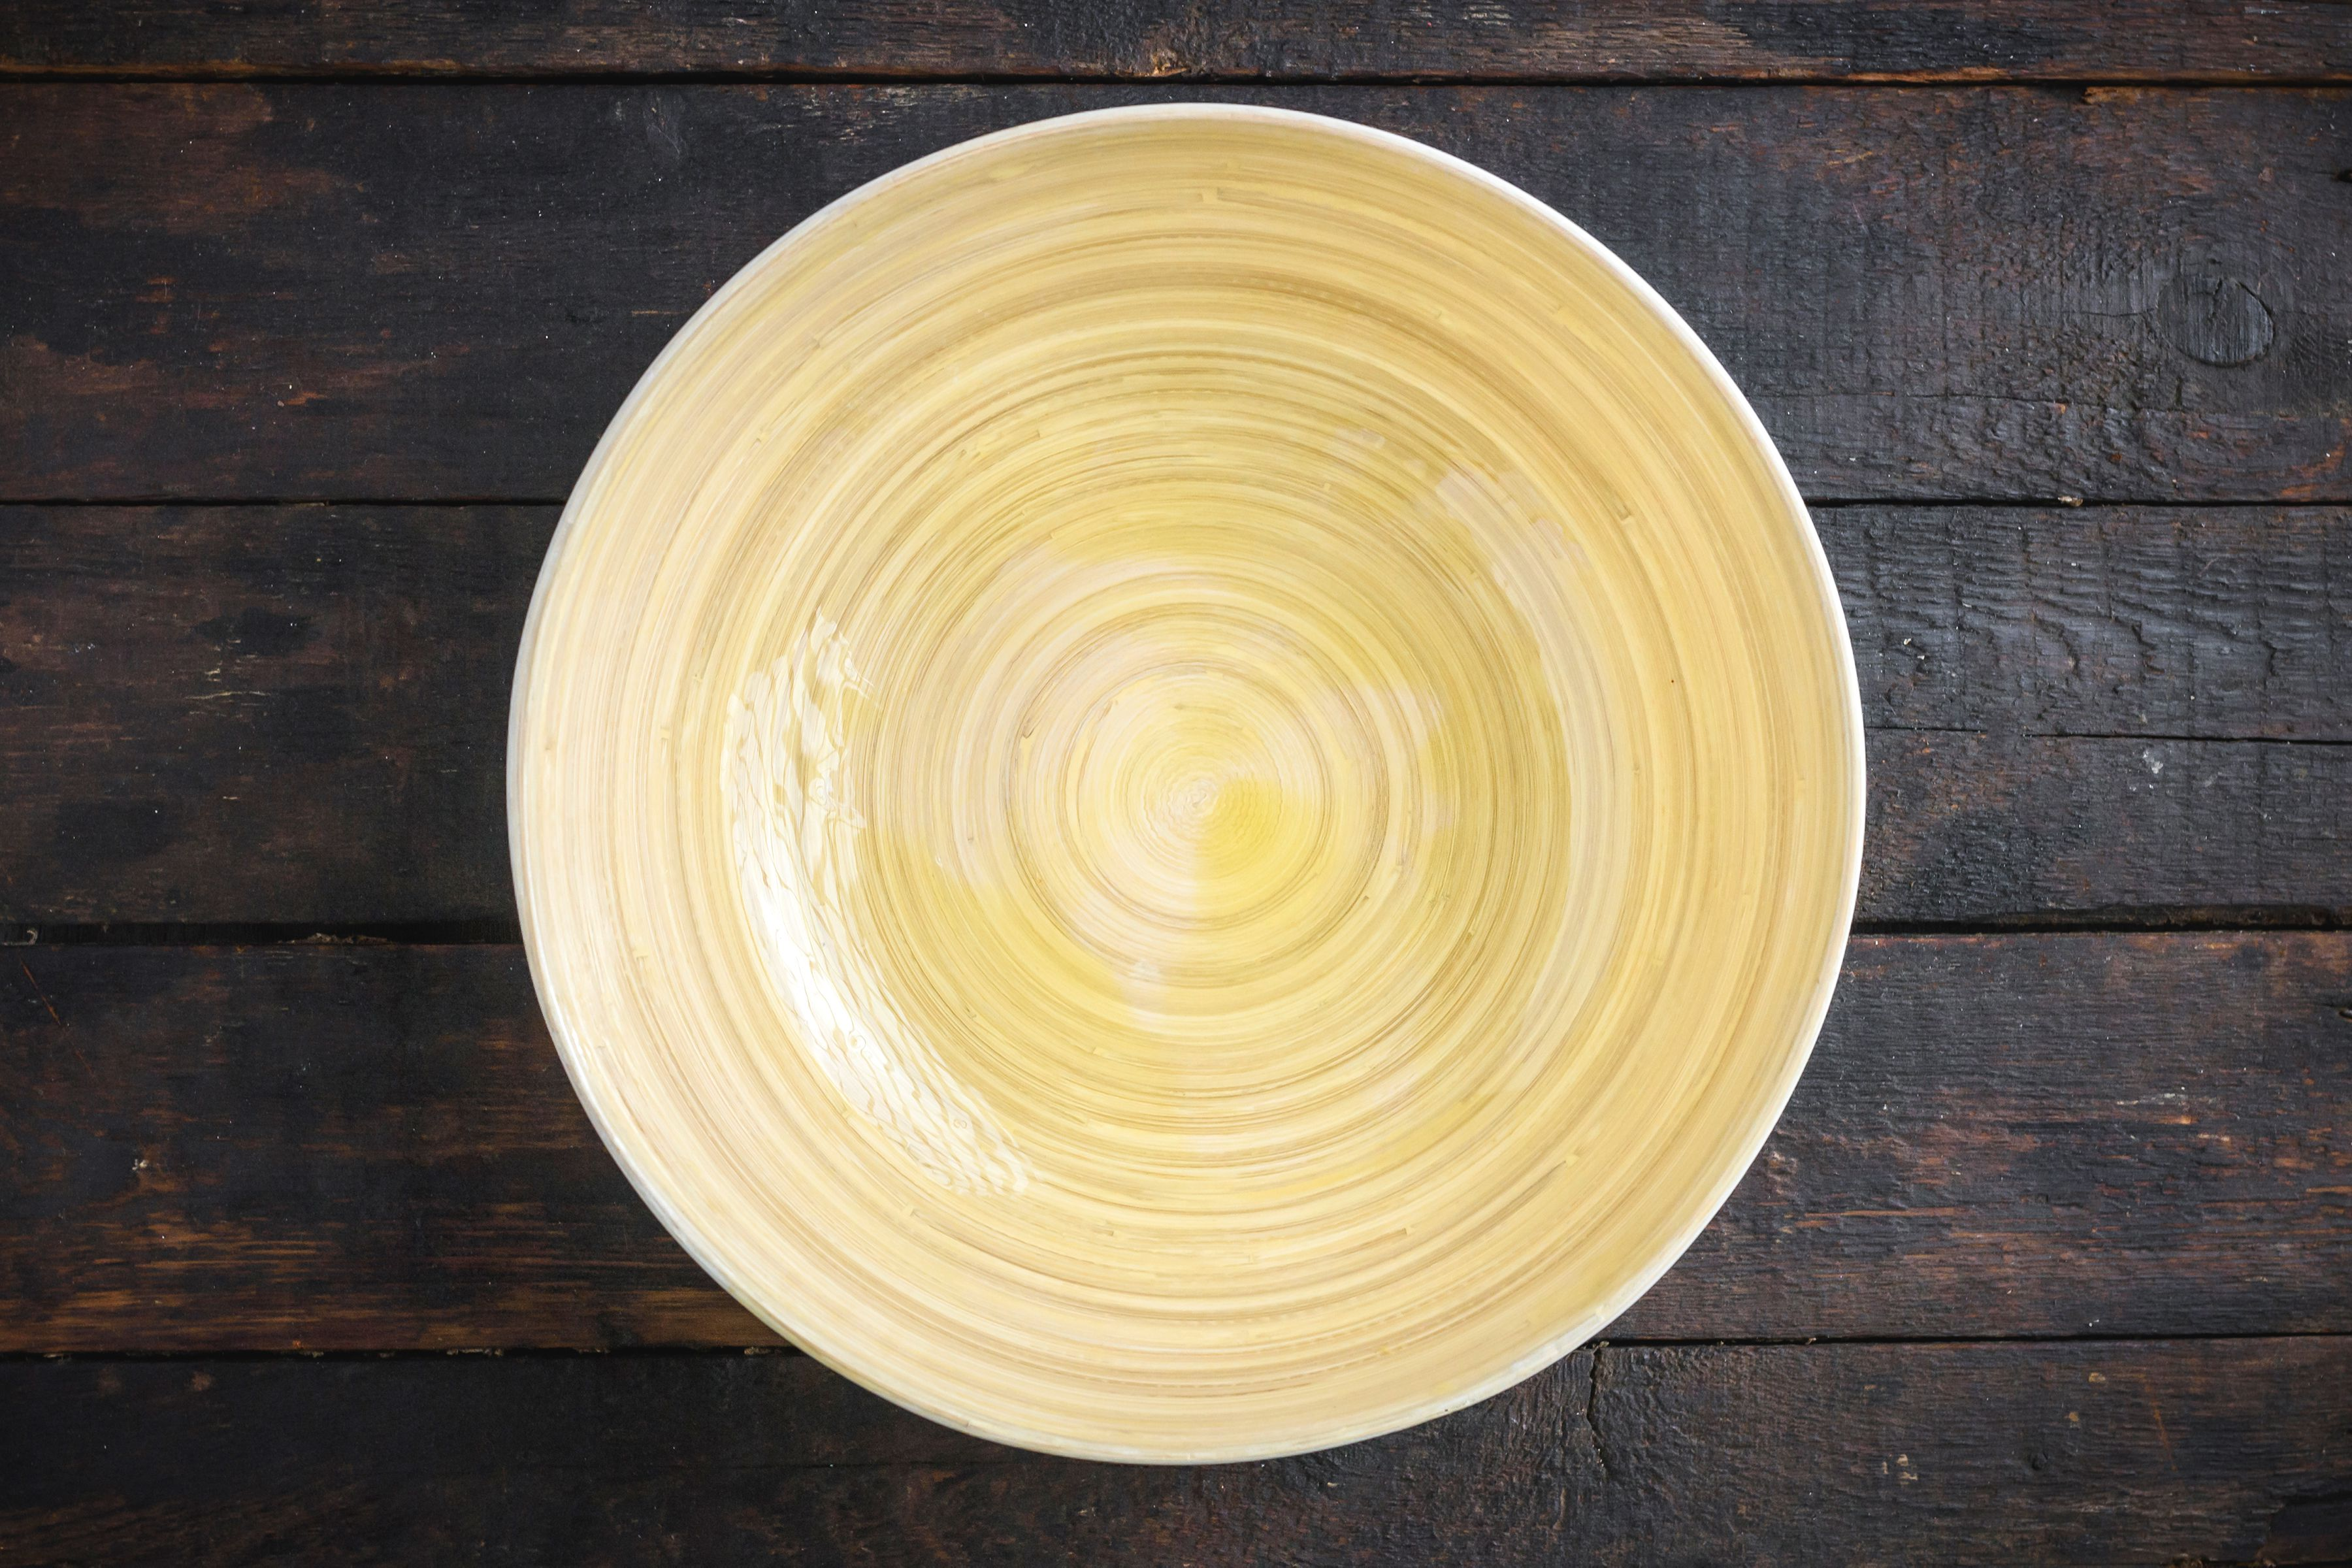 Oil a large bowl